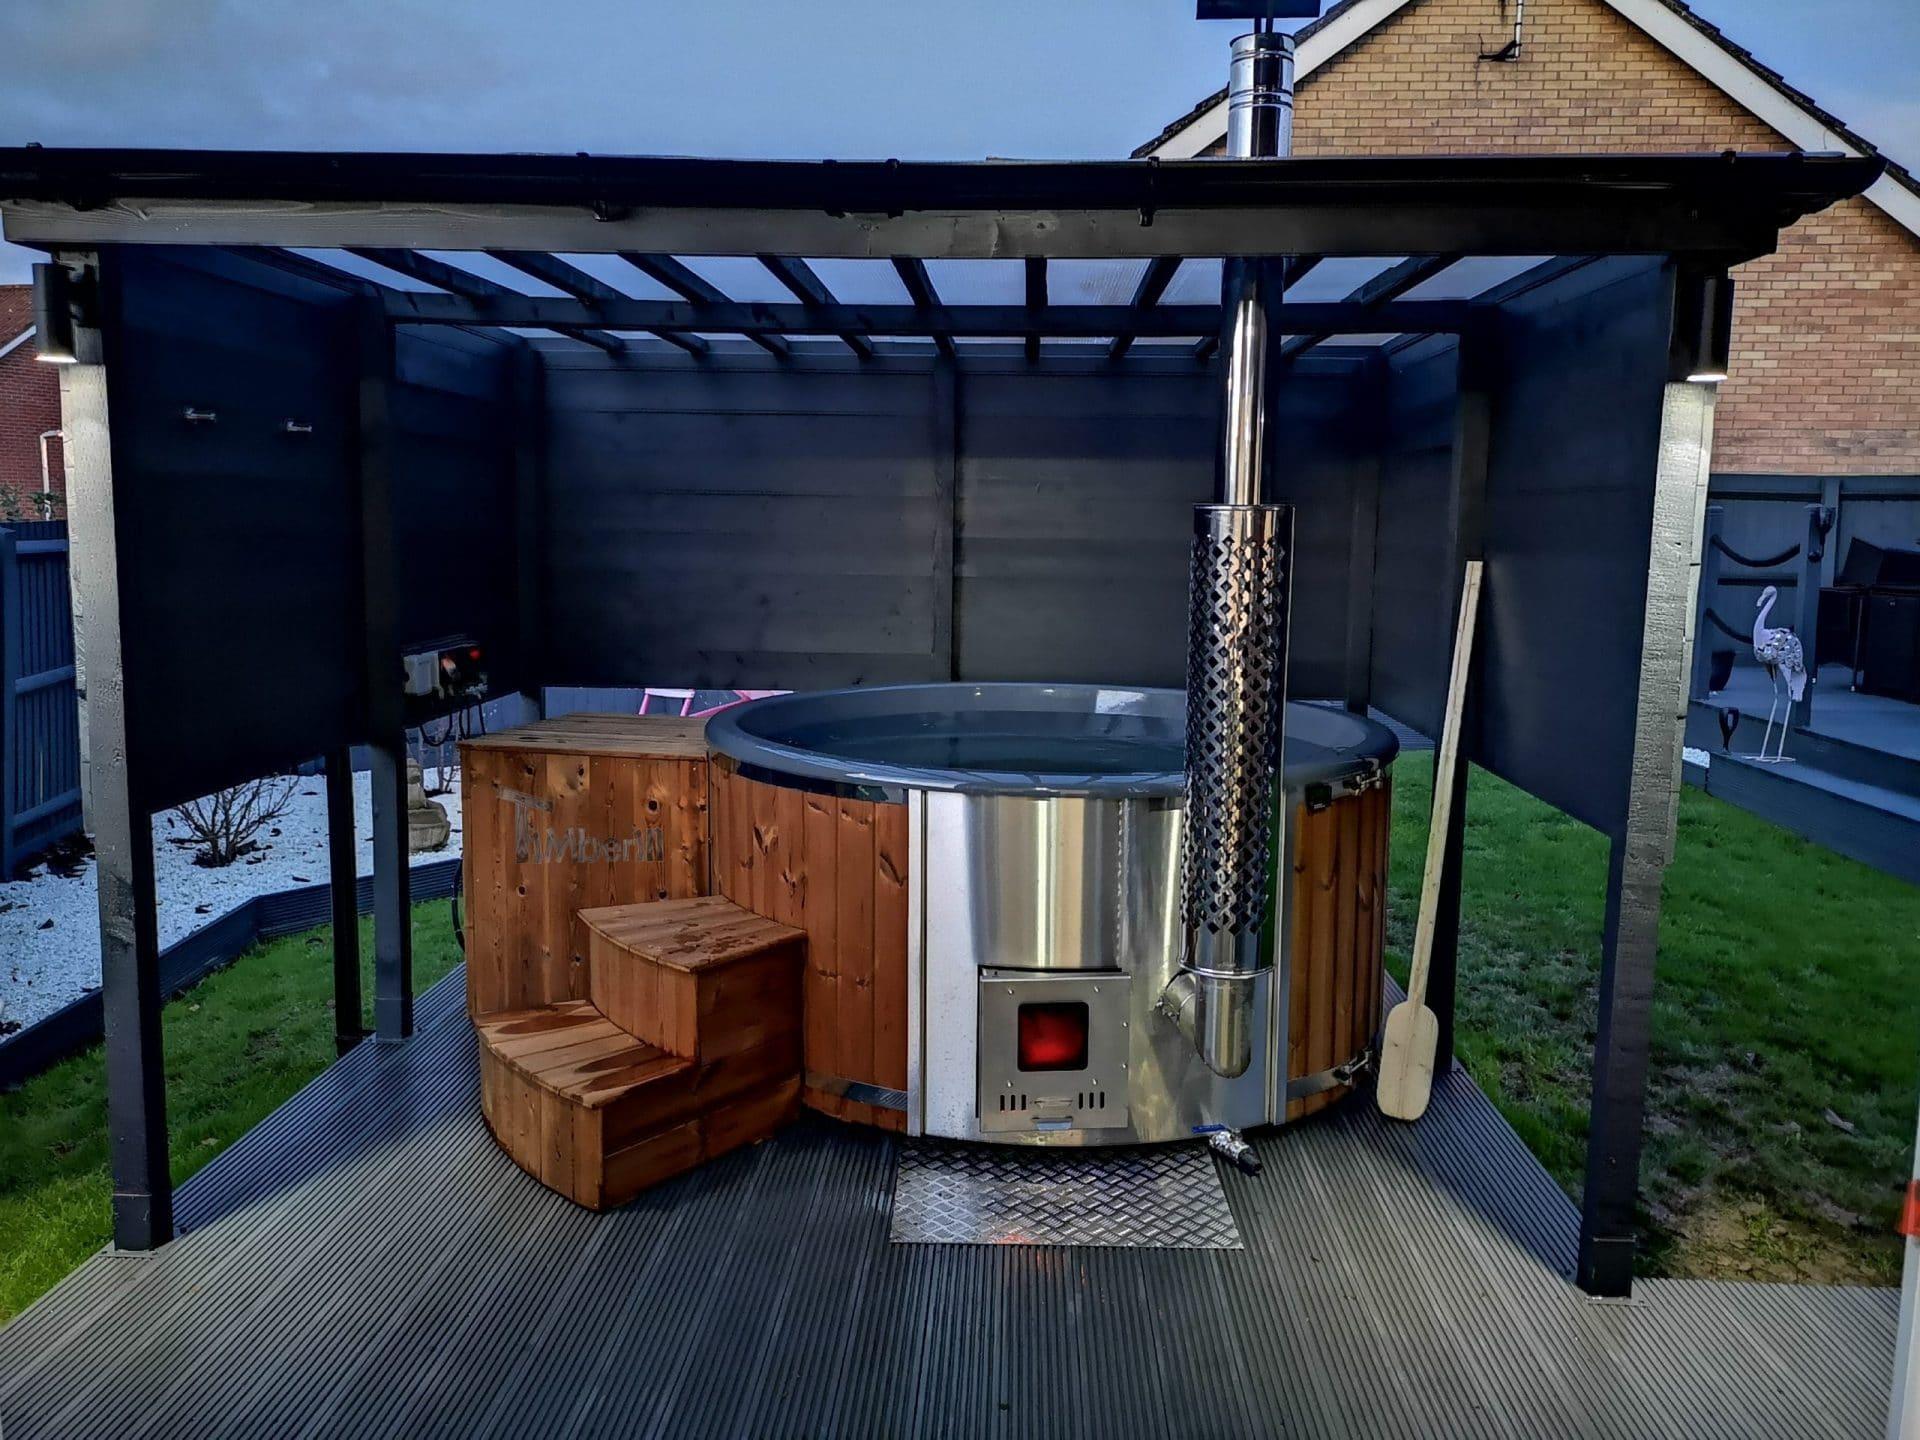 Wood burning fiberglass hot tub with integrated stove Wellness Royal Andrew Wellingborough United Kingdom scaled